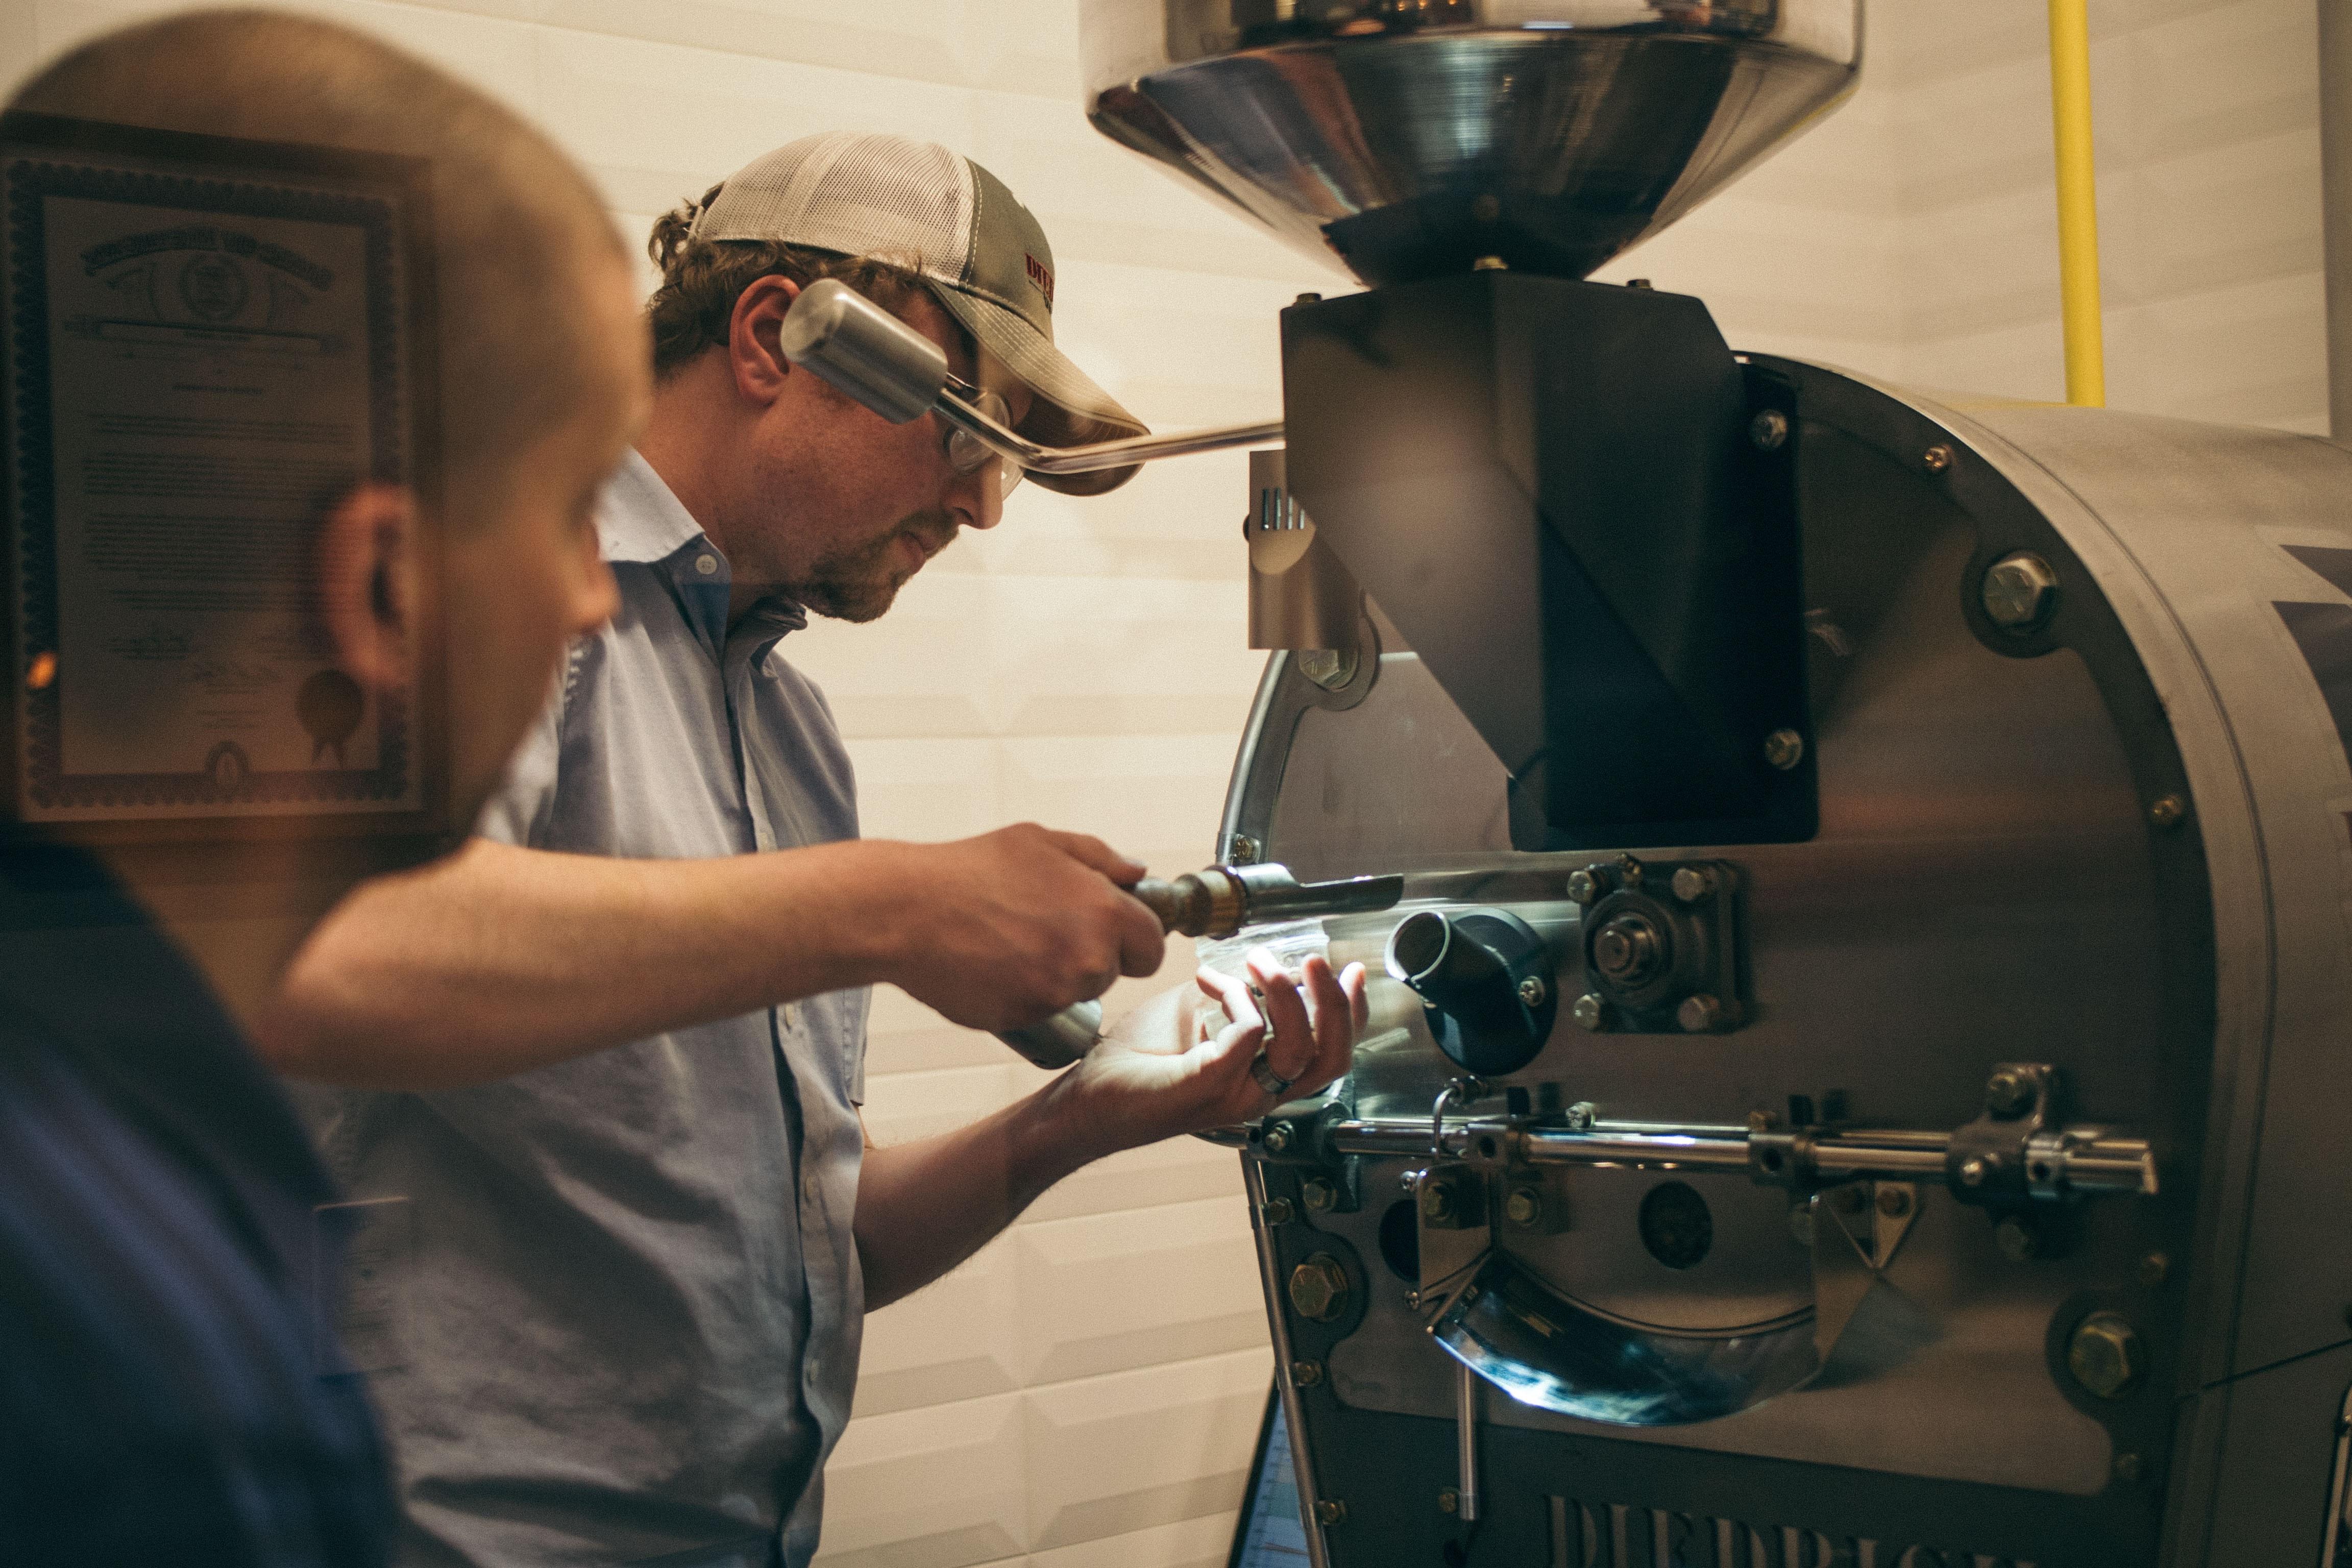 battlecreek-coffee-roasters-JUPPTsfCuiQ-unsplash